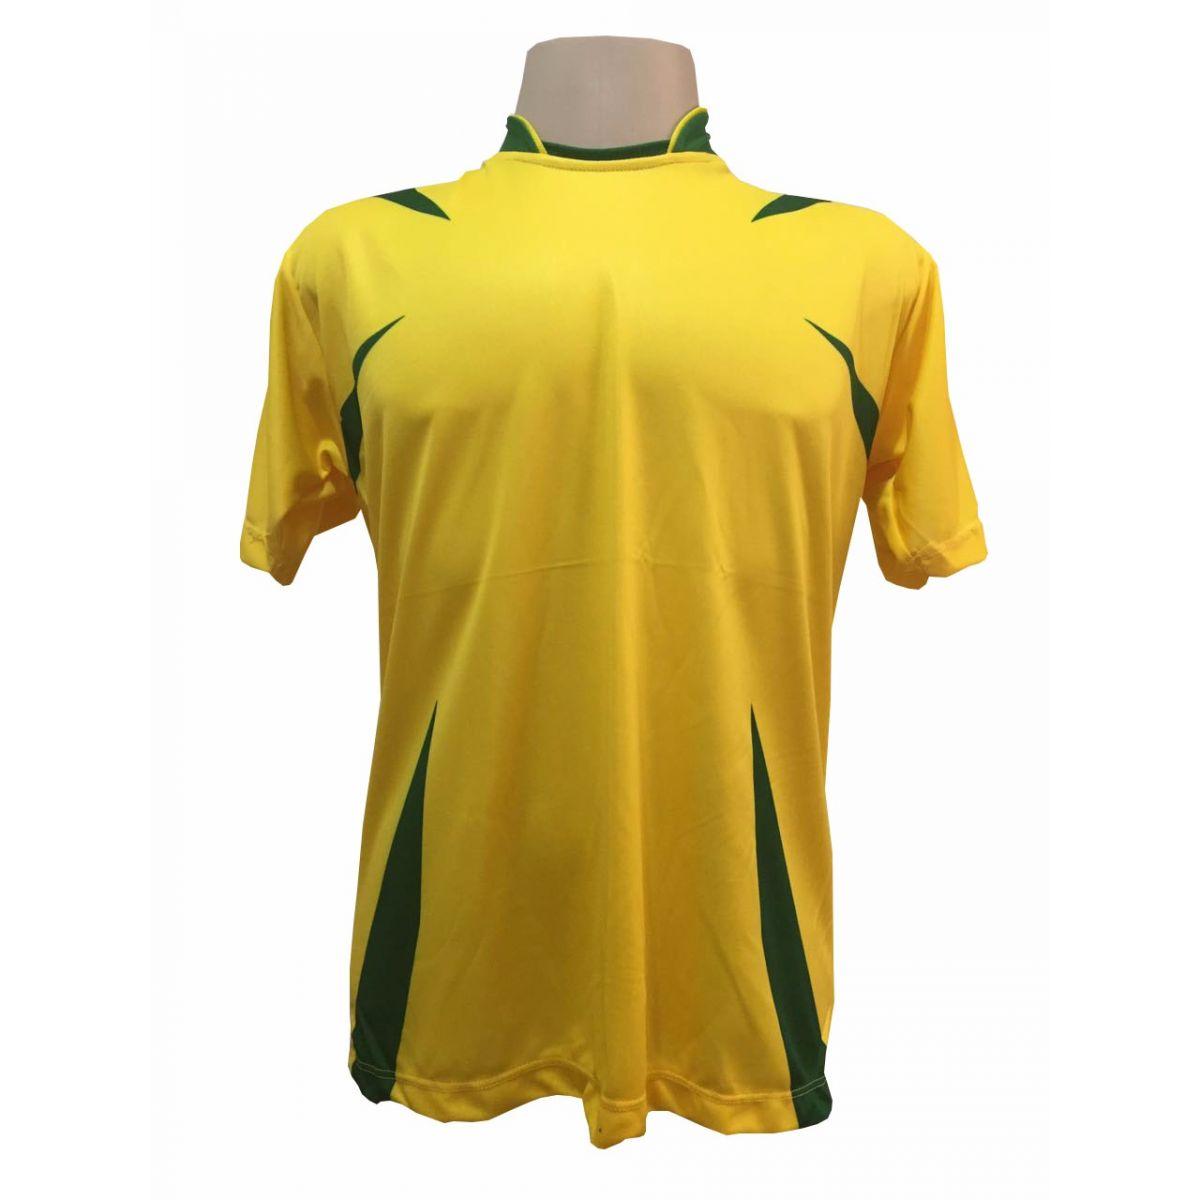 Jogo de Camisa com 14 unidades modelo Palermo Amarelo/Verde + Brindes